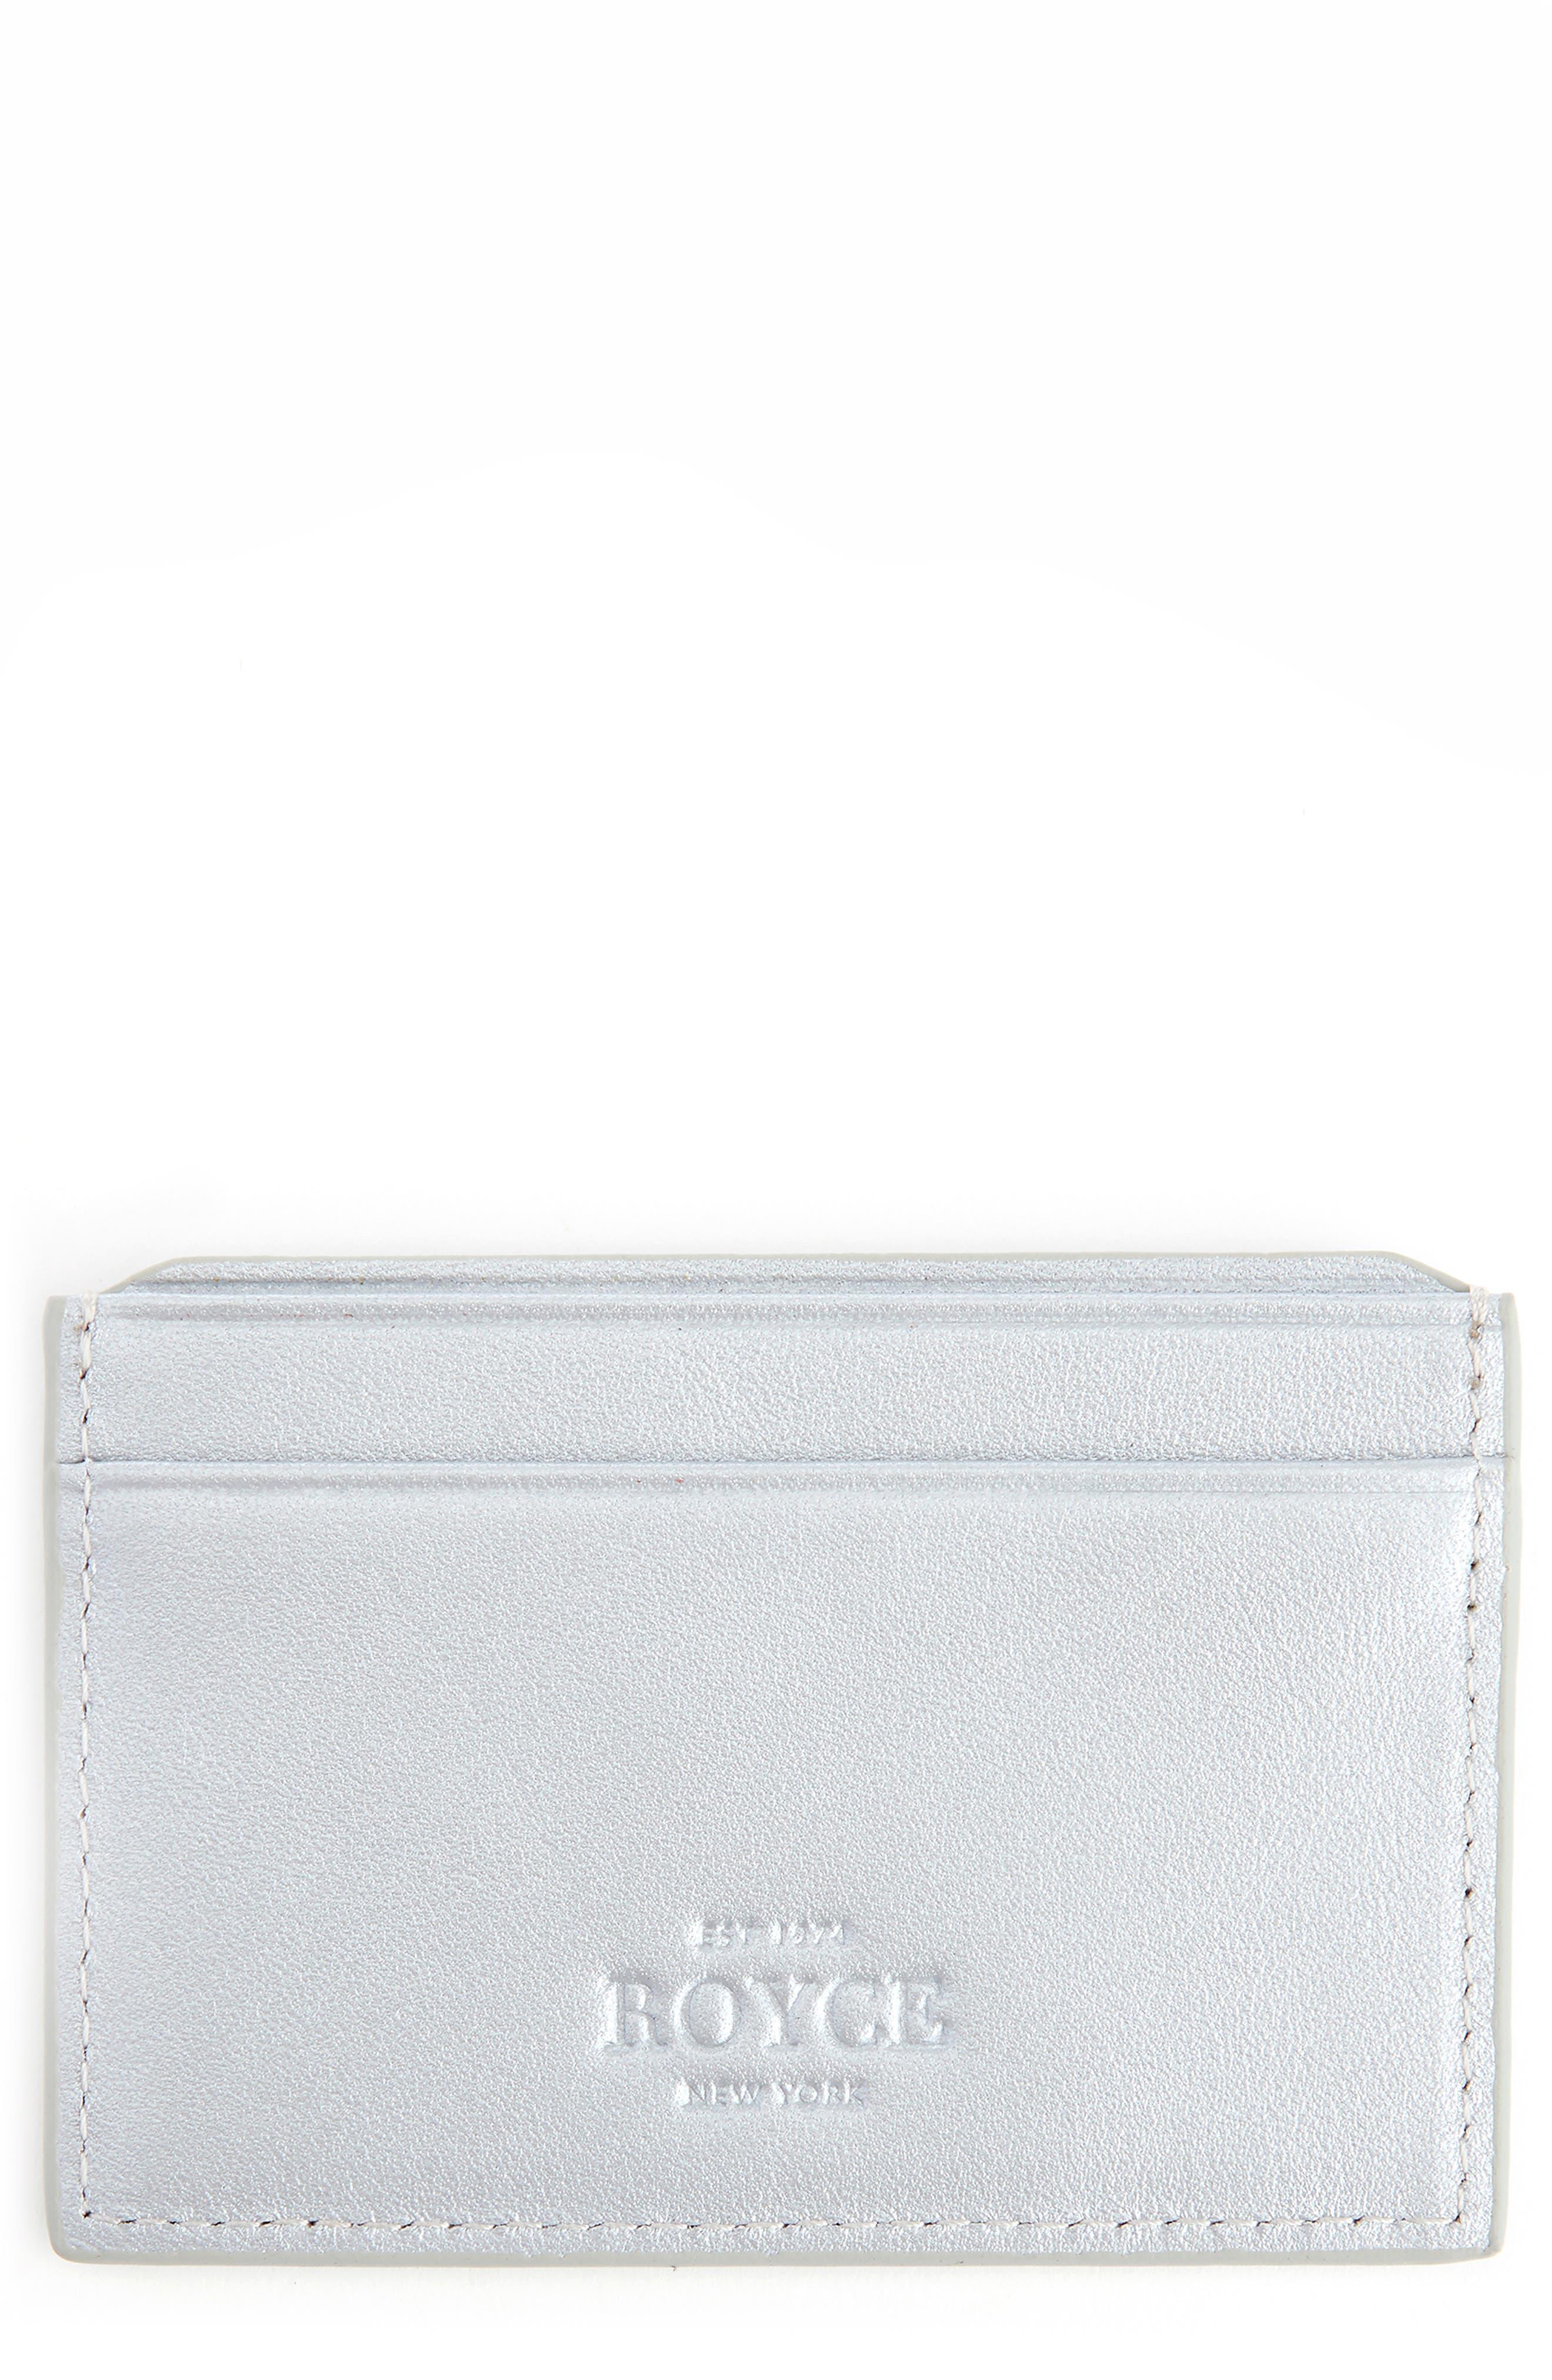 Royce Rfid Leather Card Case - Metallic